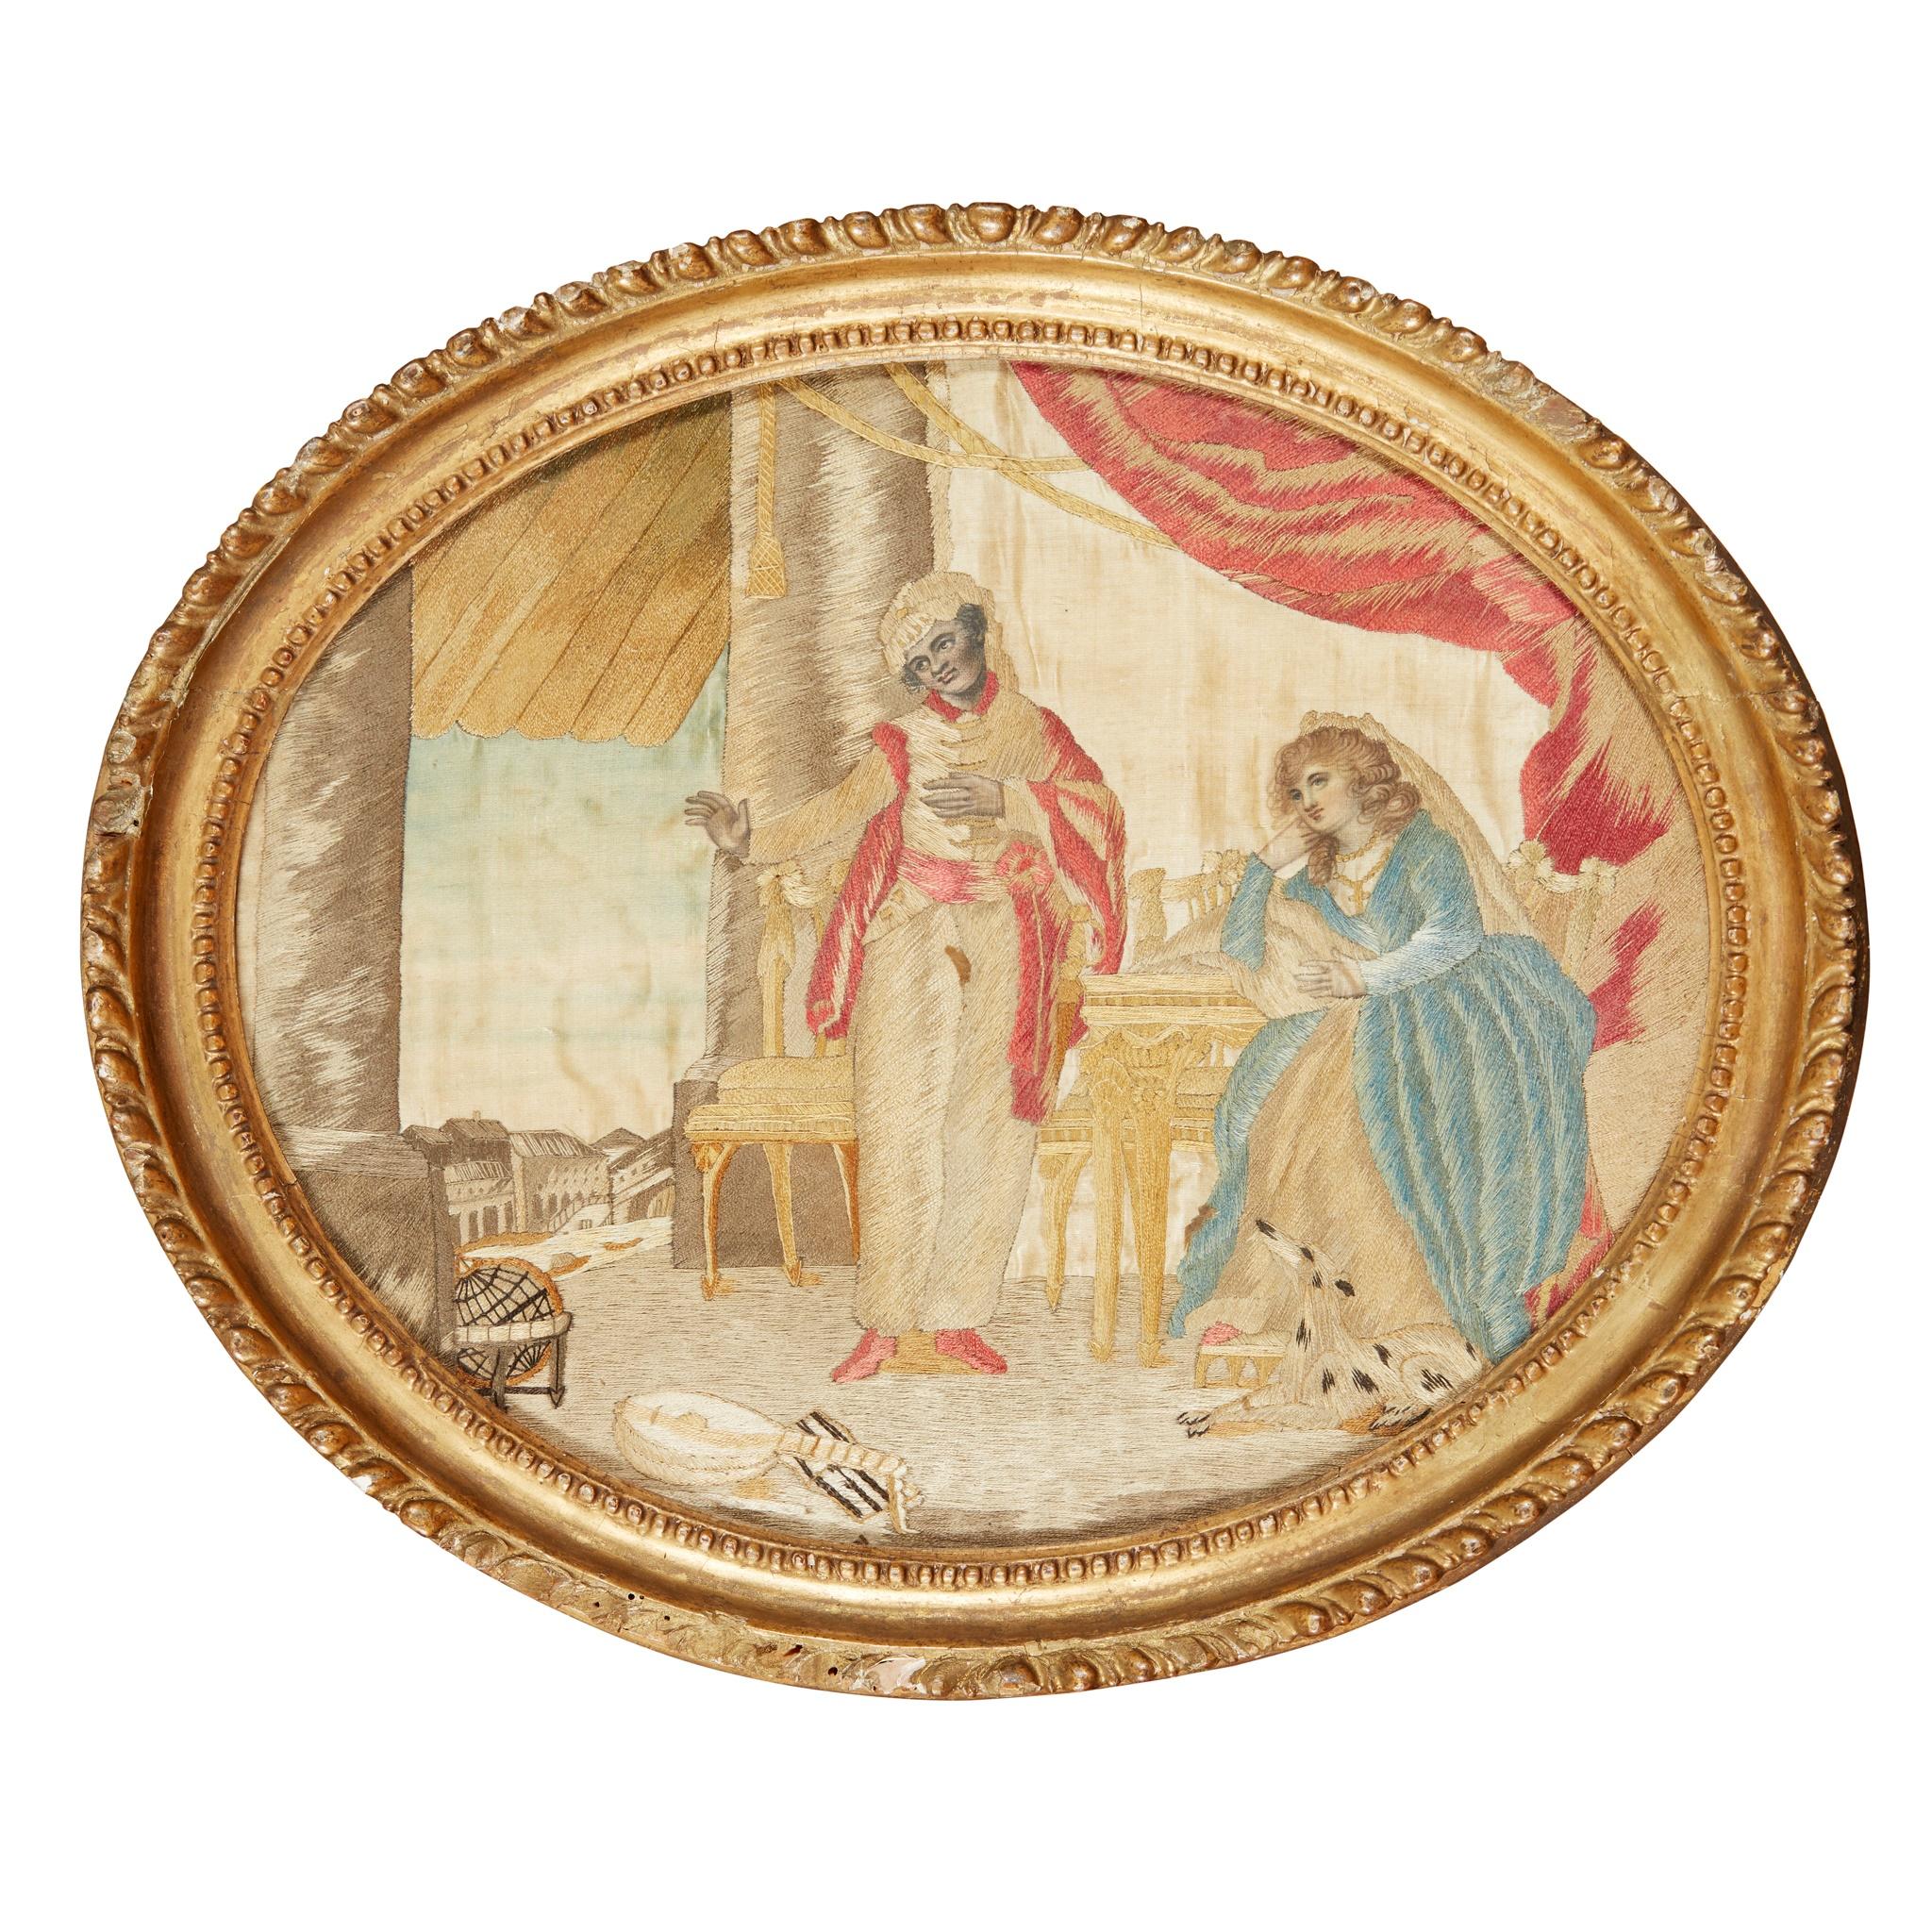 GEORGIAN NEEDLEWORK PANEL DEPICTING OTHELLO AND DESDEMONA LATE 18TH CENTURY